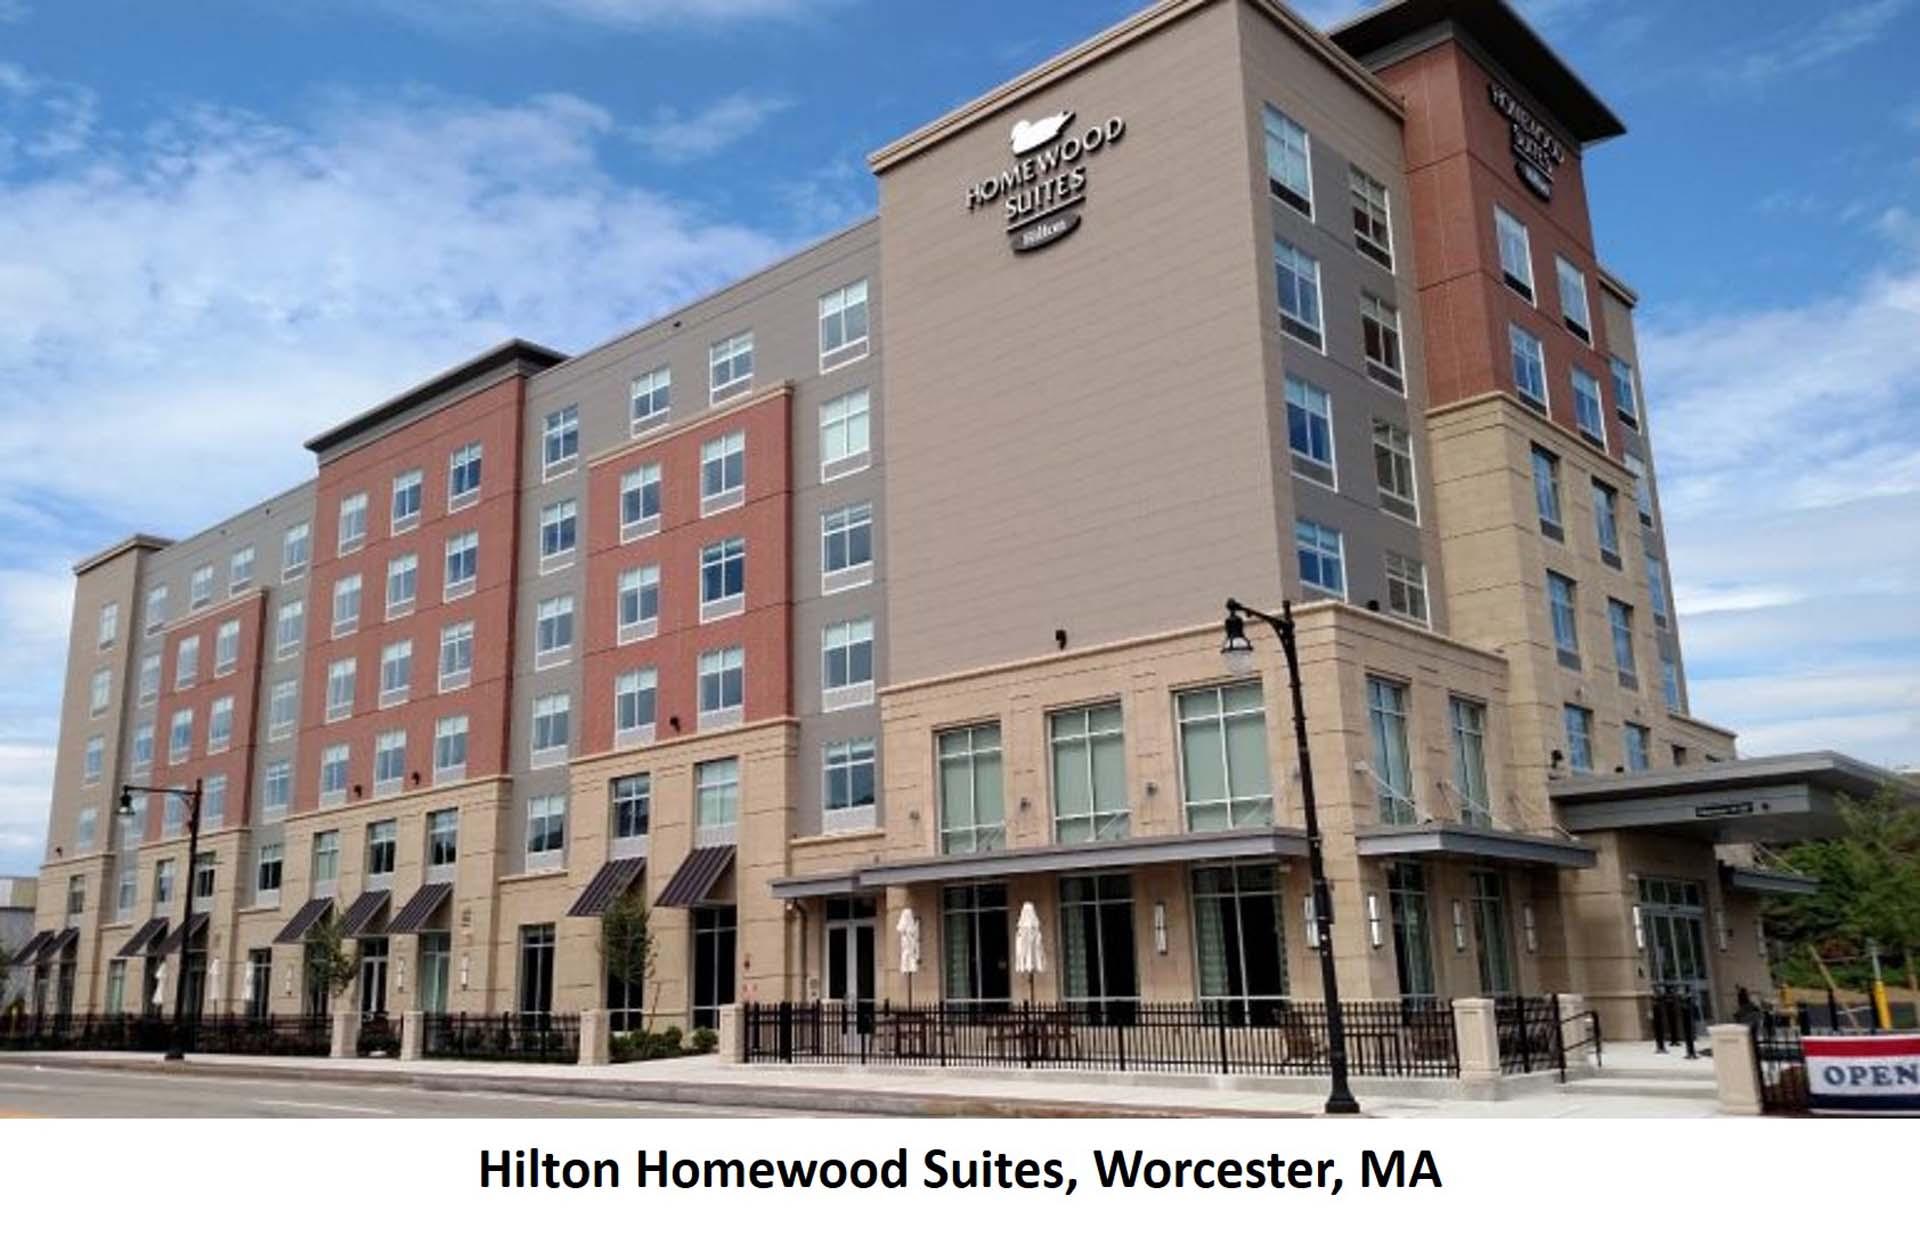 Hilton Homewood Suites Worcester MA